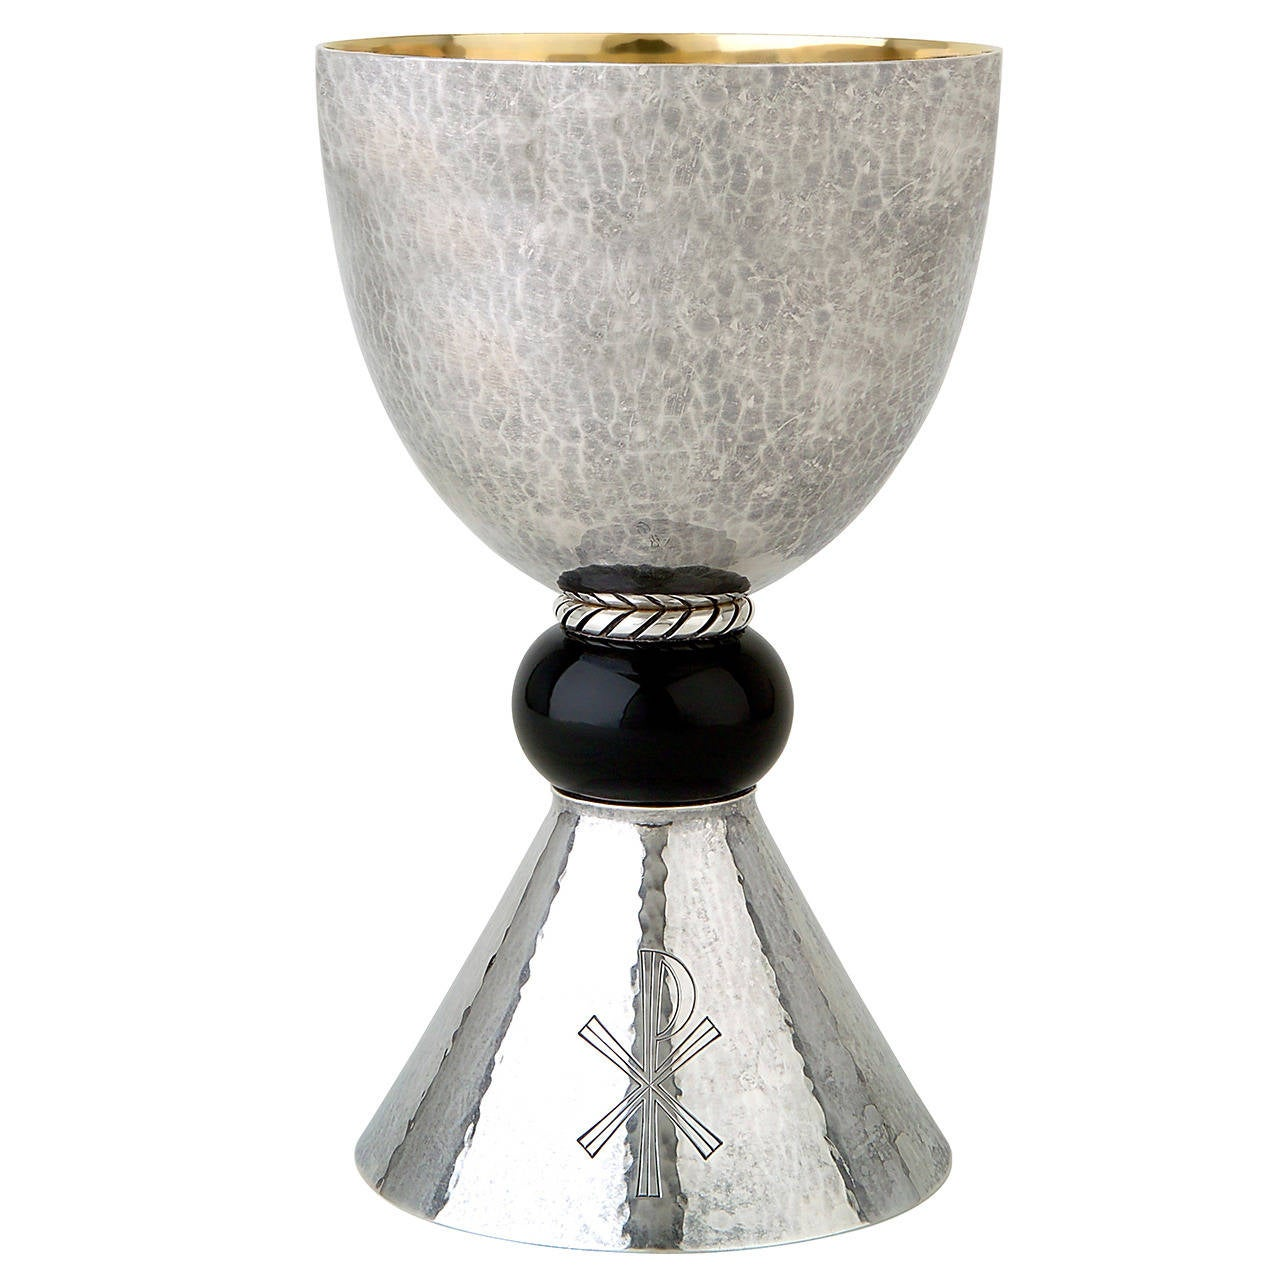 Korean Home Decor A Dutch American Art Deco Sterling Silver Chalice By